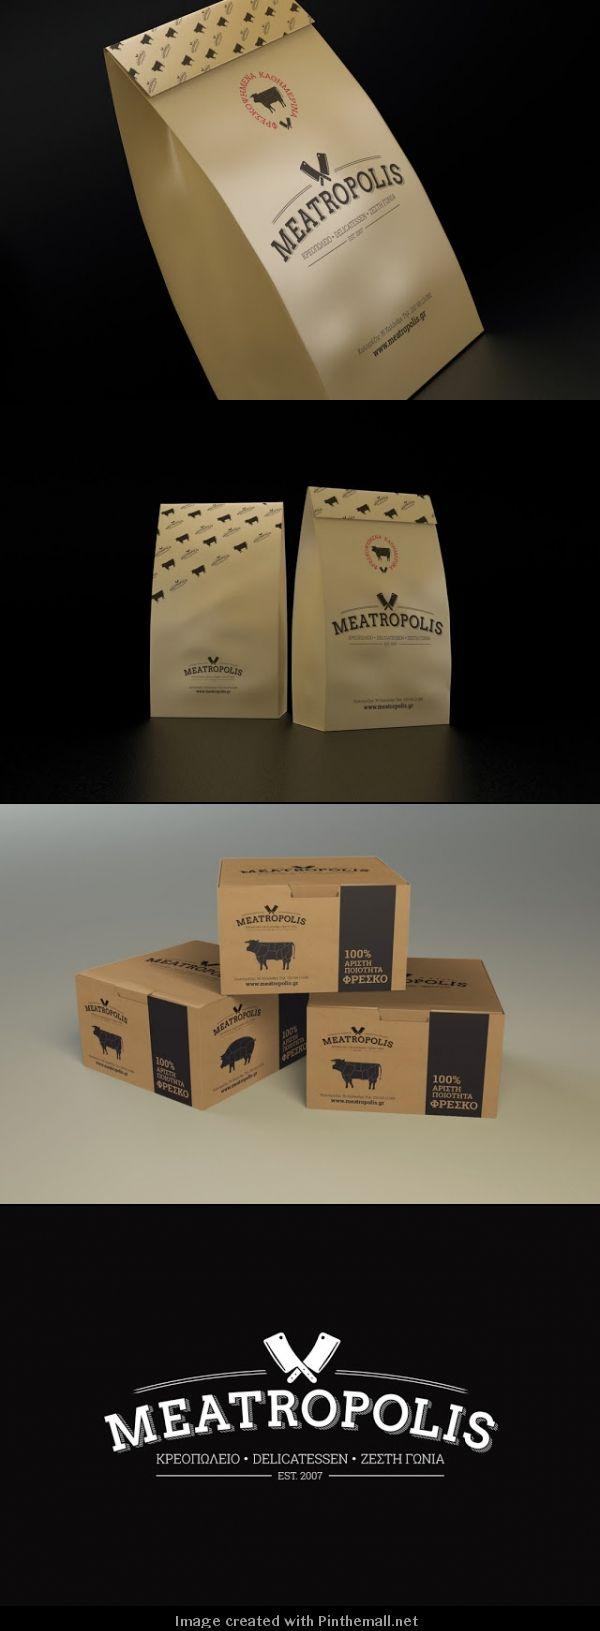 Meatropolis butcher shop. Meet me at Meatropis for lunch #packaging PD